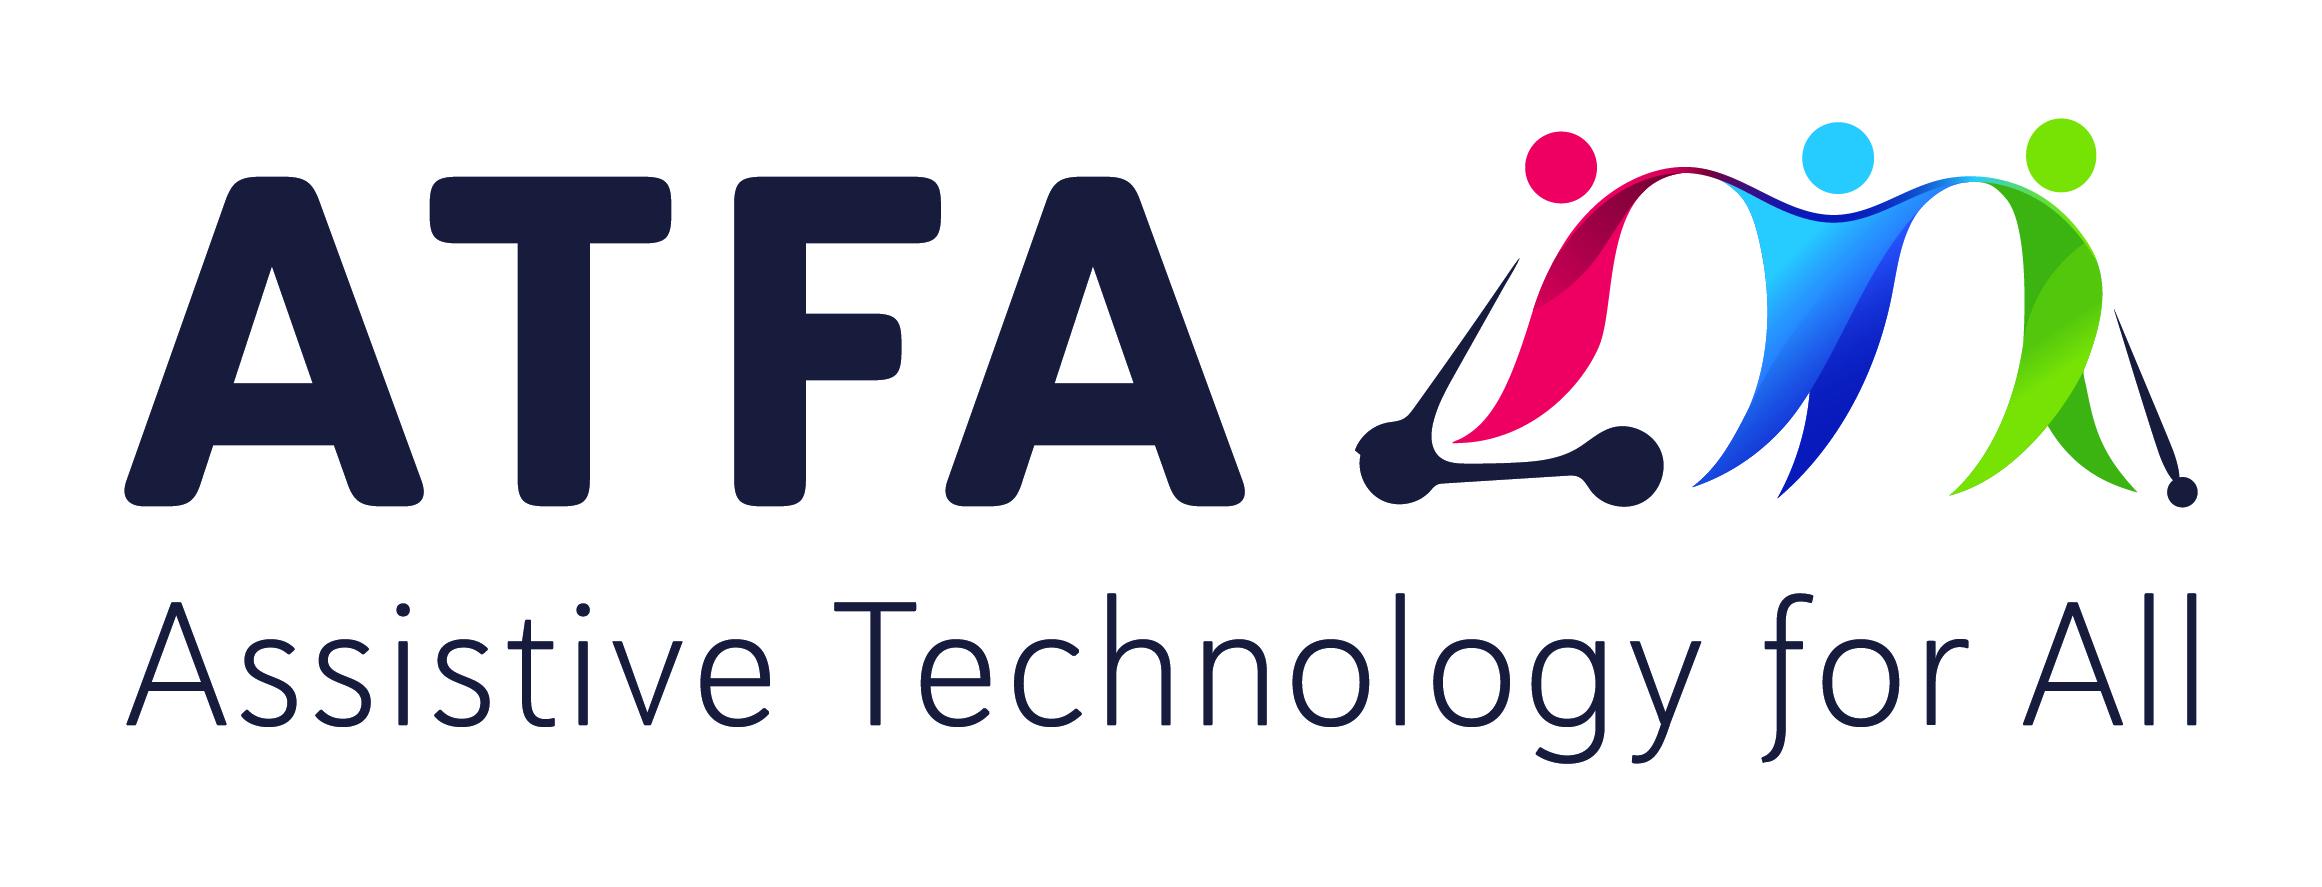 Assistive Technology for All (ATFA) logo